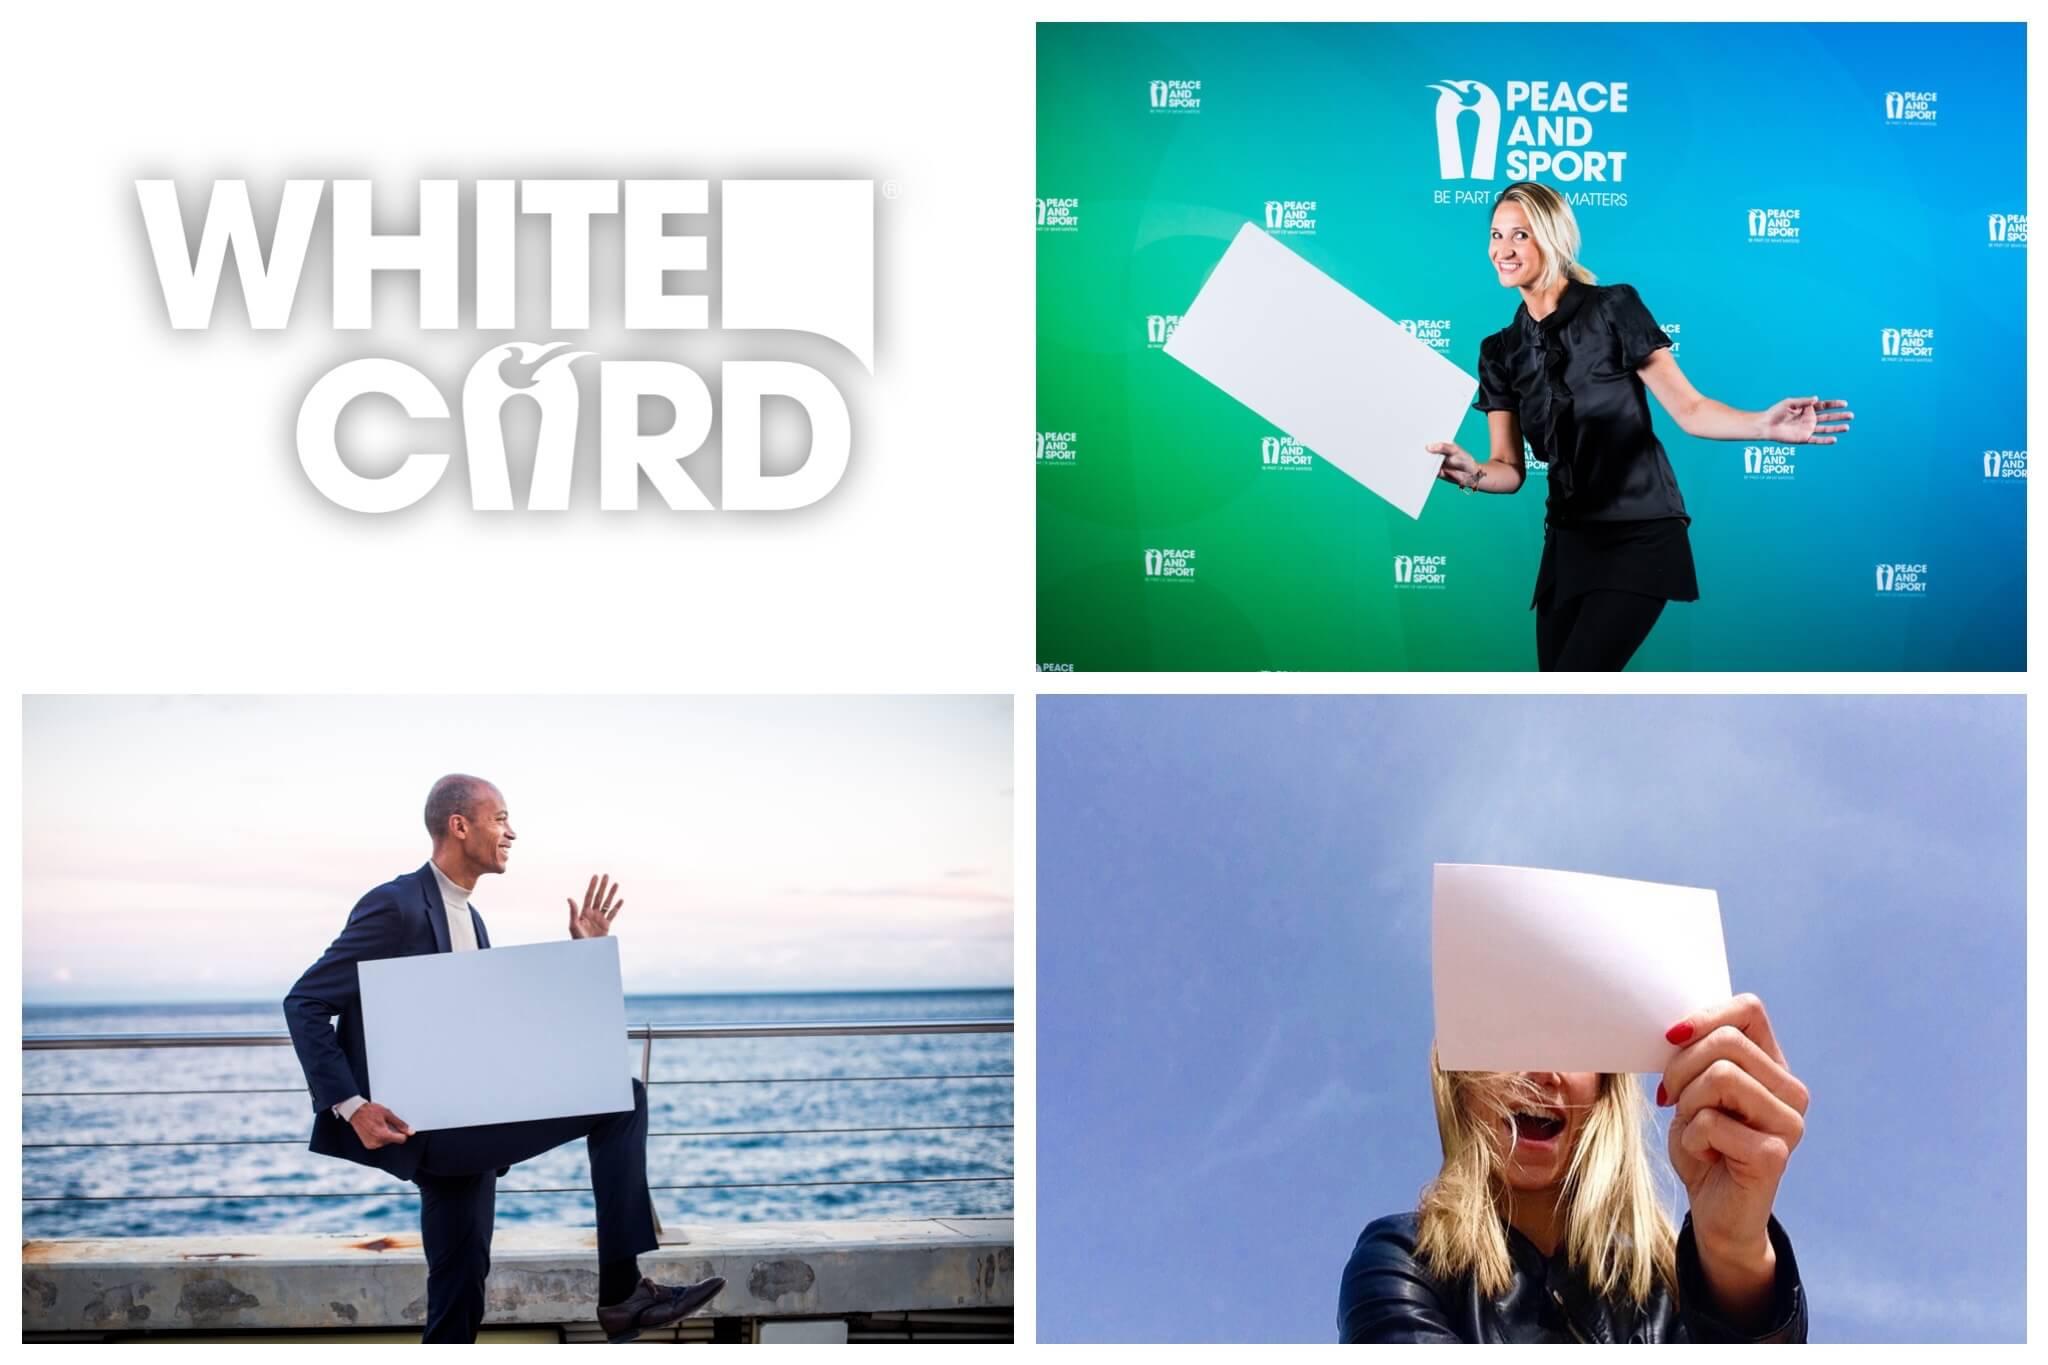 Tatiana Golovin et Stéphane Diagana pour l'opération #WhiteCard